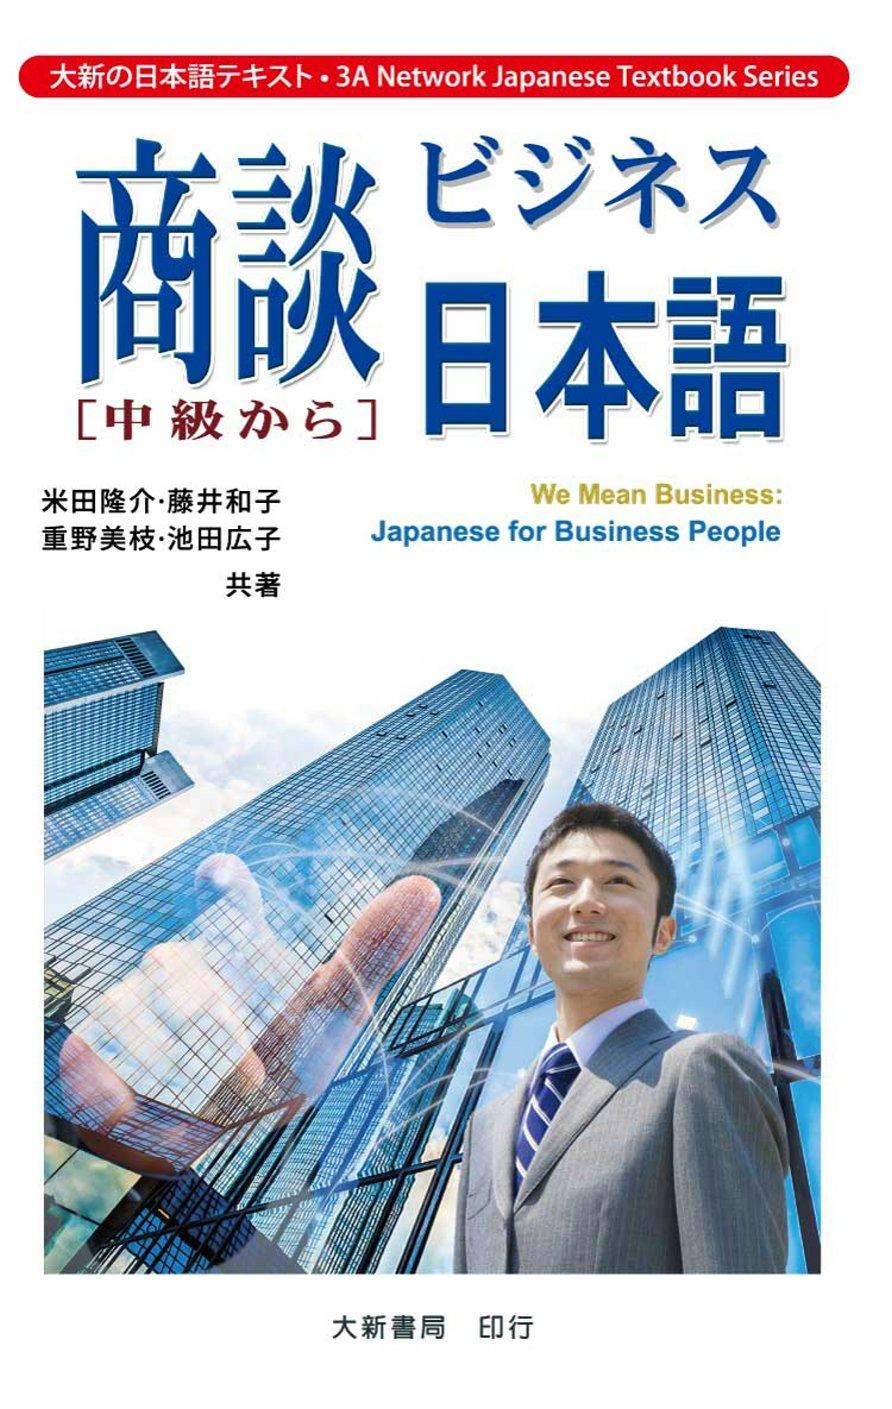 商談日本語(中級)